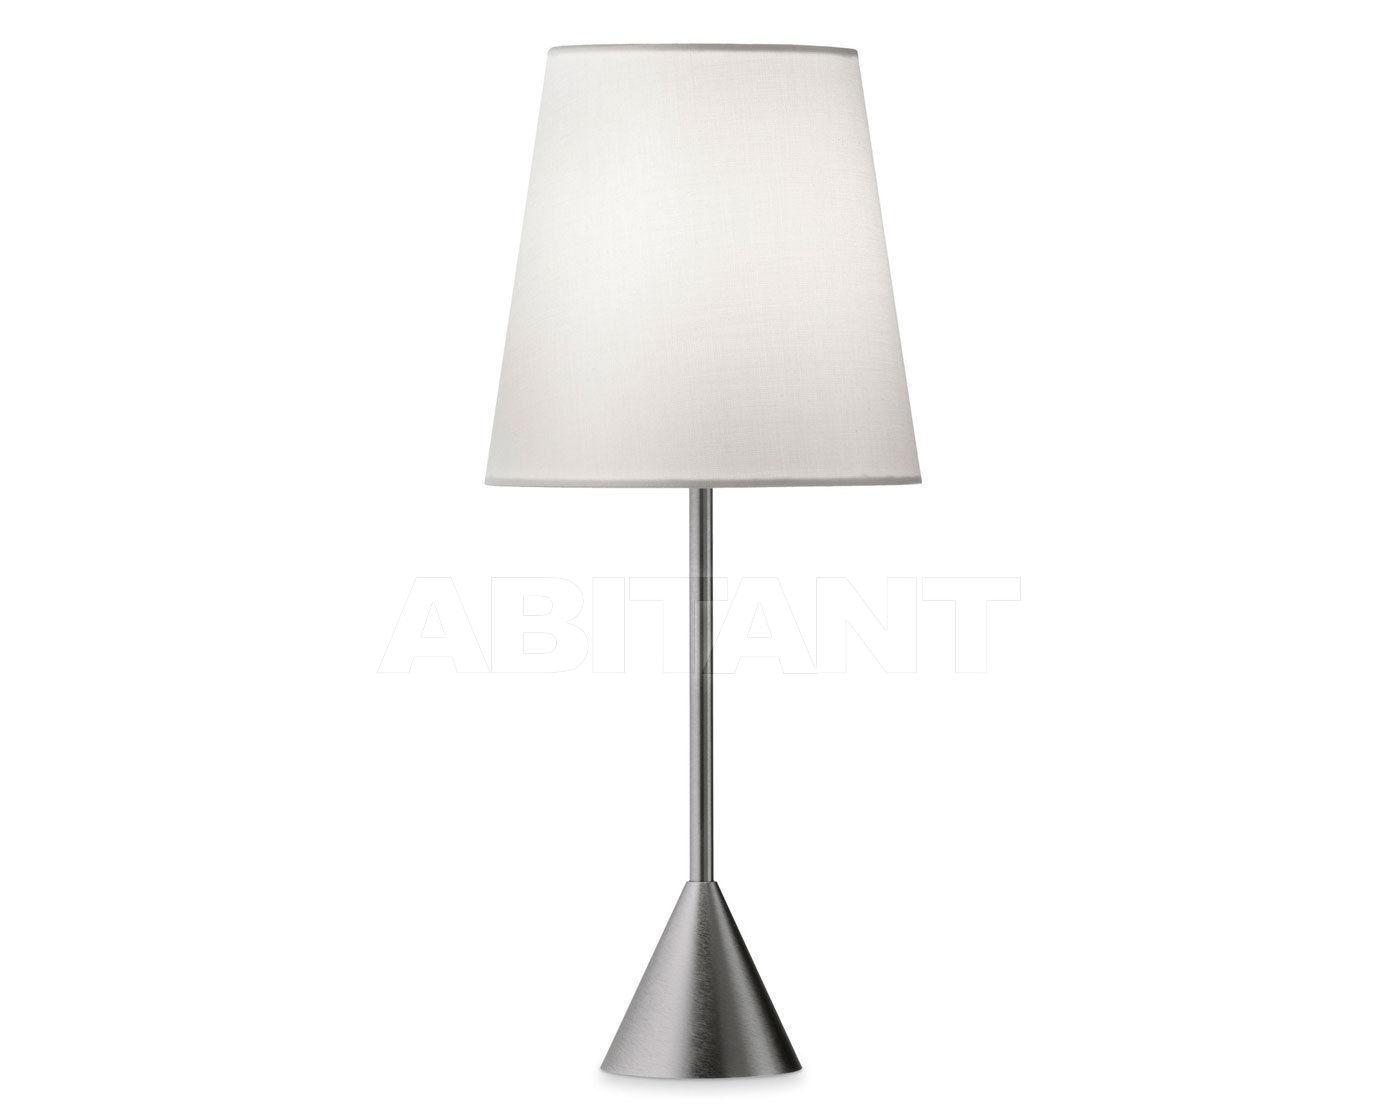 Buy Table lamp LUCILLA Modo Luce 2018 LUCETP042C01 2